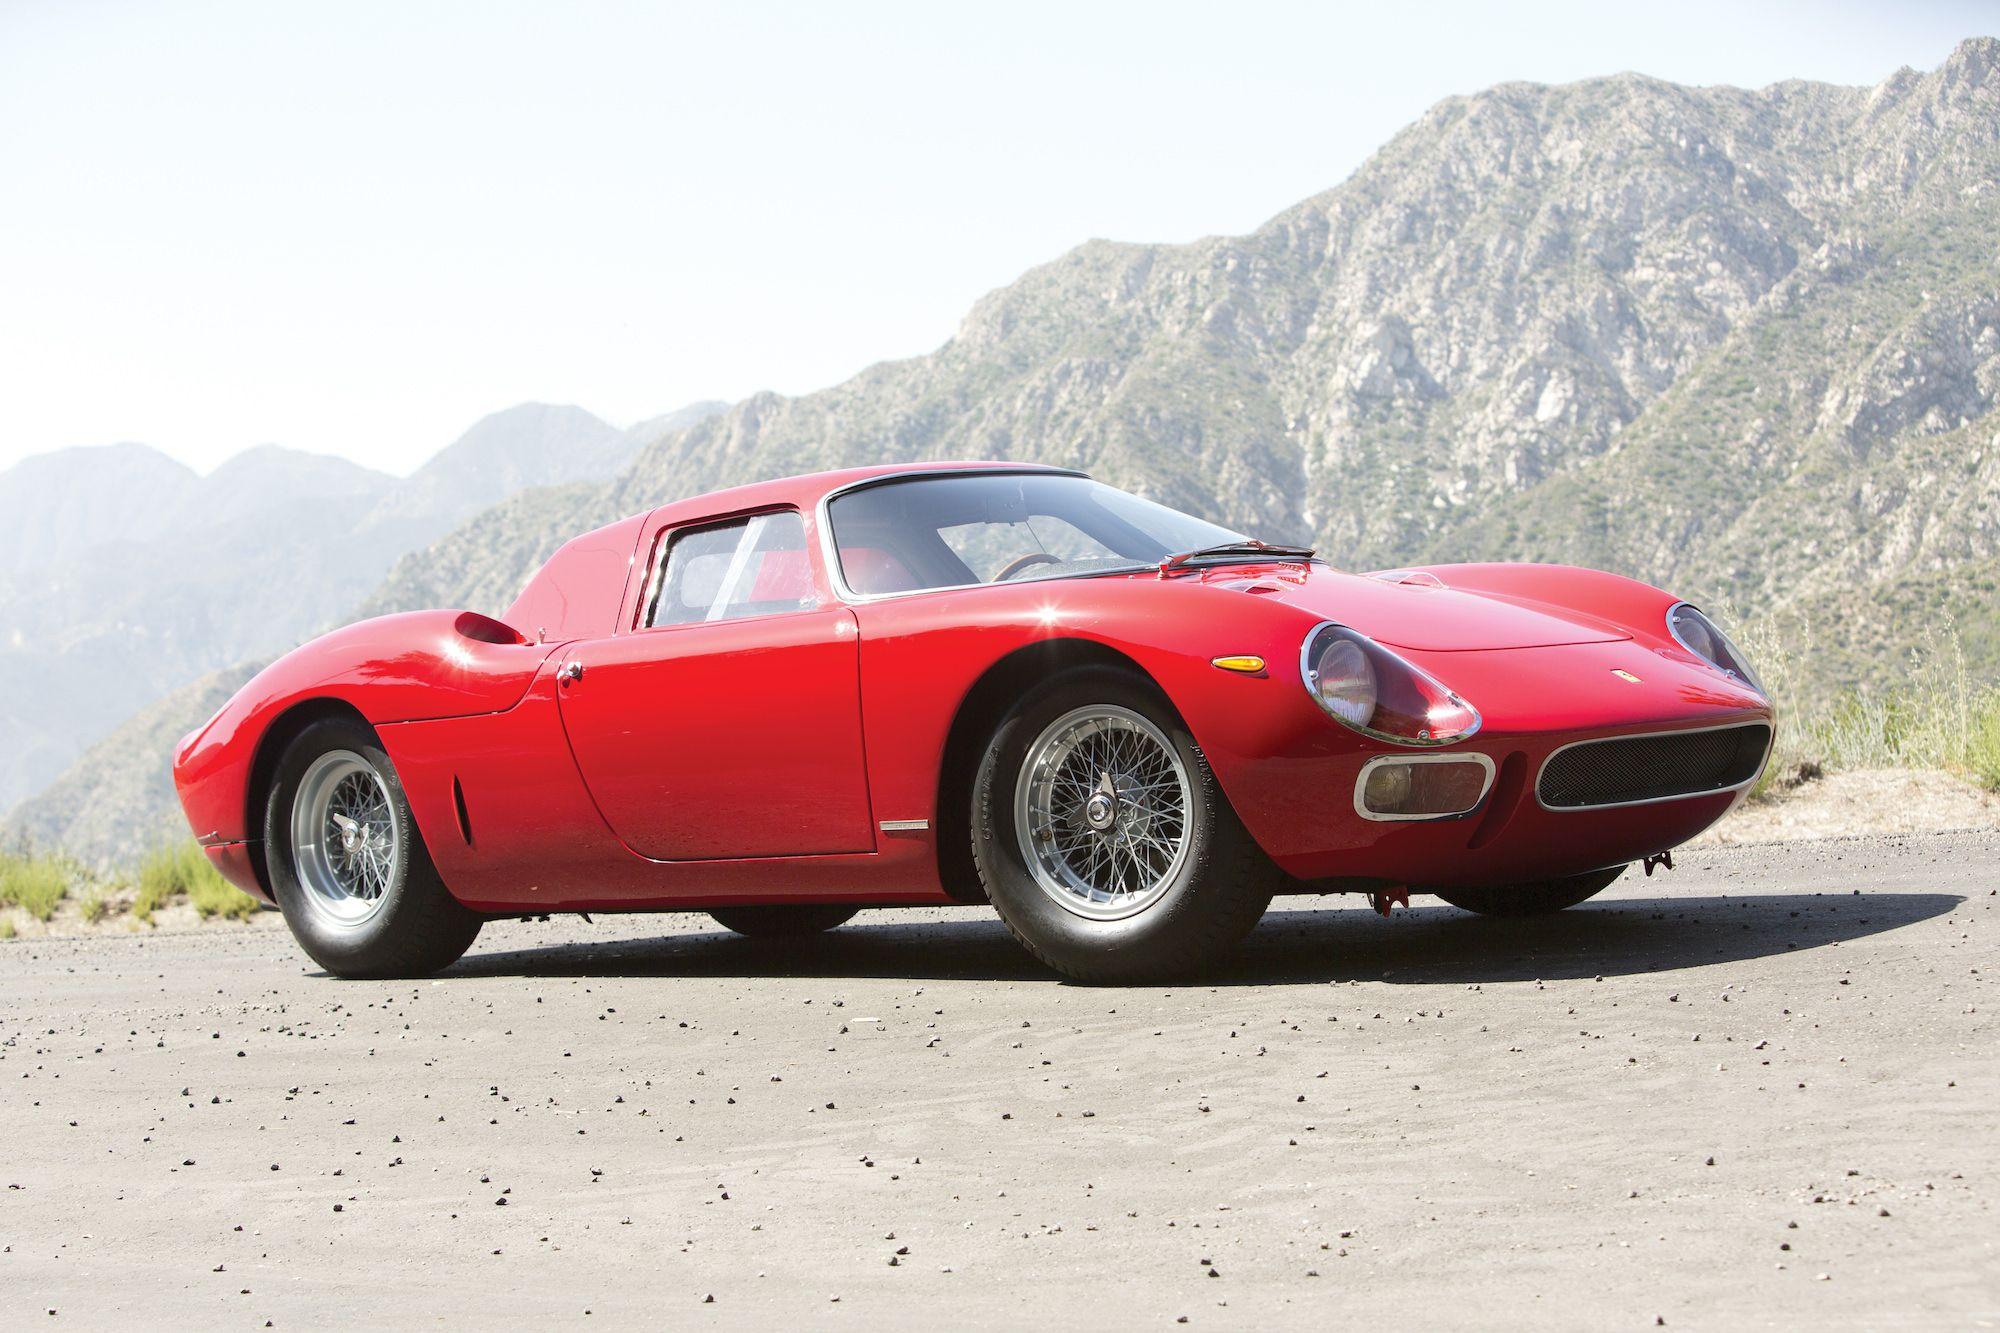 1964 Ferrari 250 LM by Scaglietti | Ferrari, Kit cars and Le mans